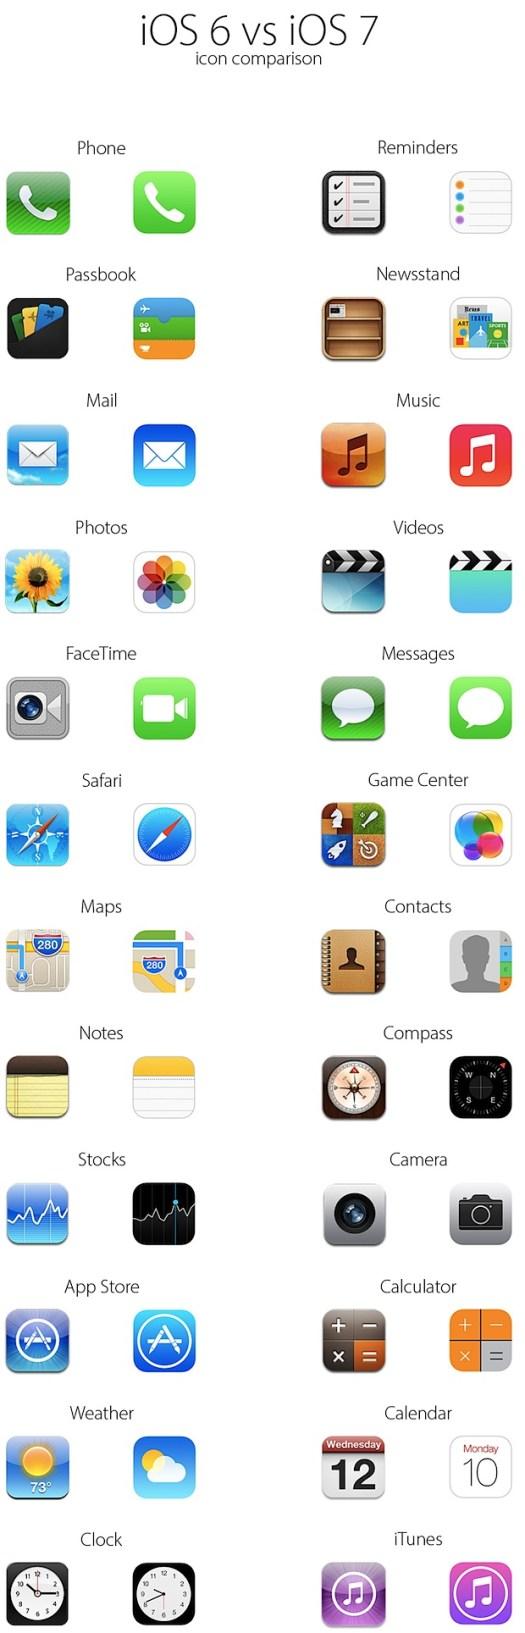 iOS 6 vs iOS 7 Icons